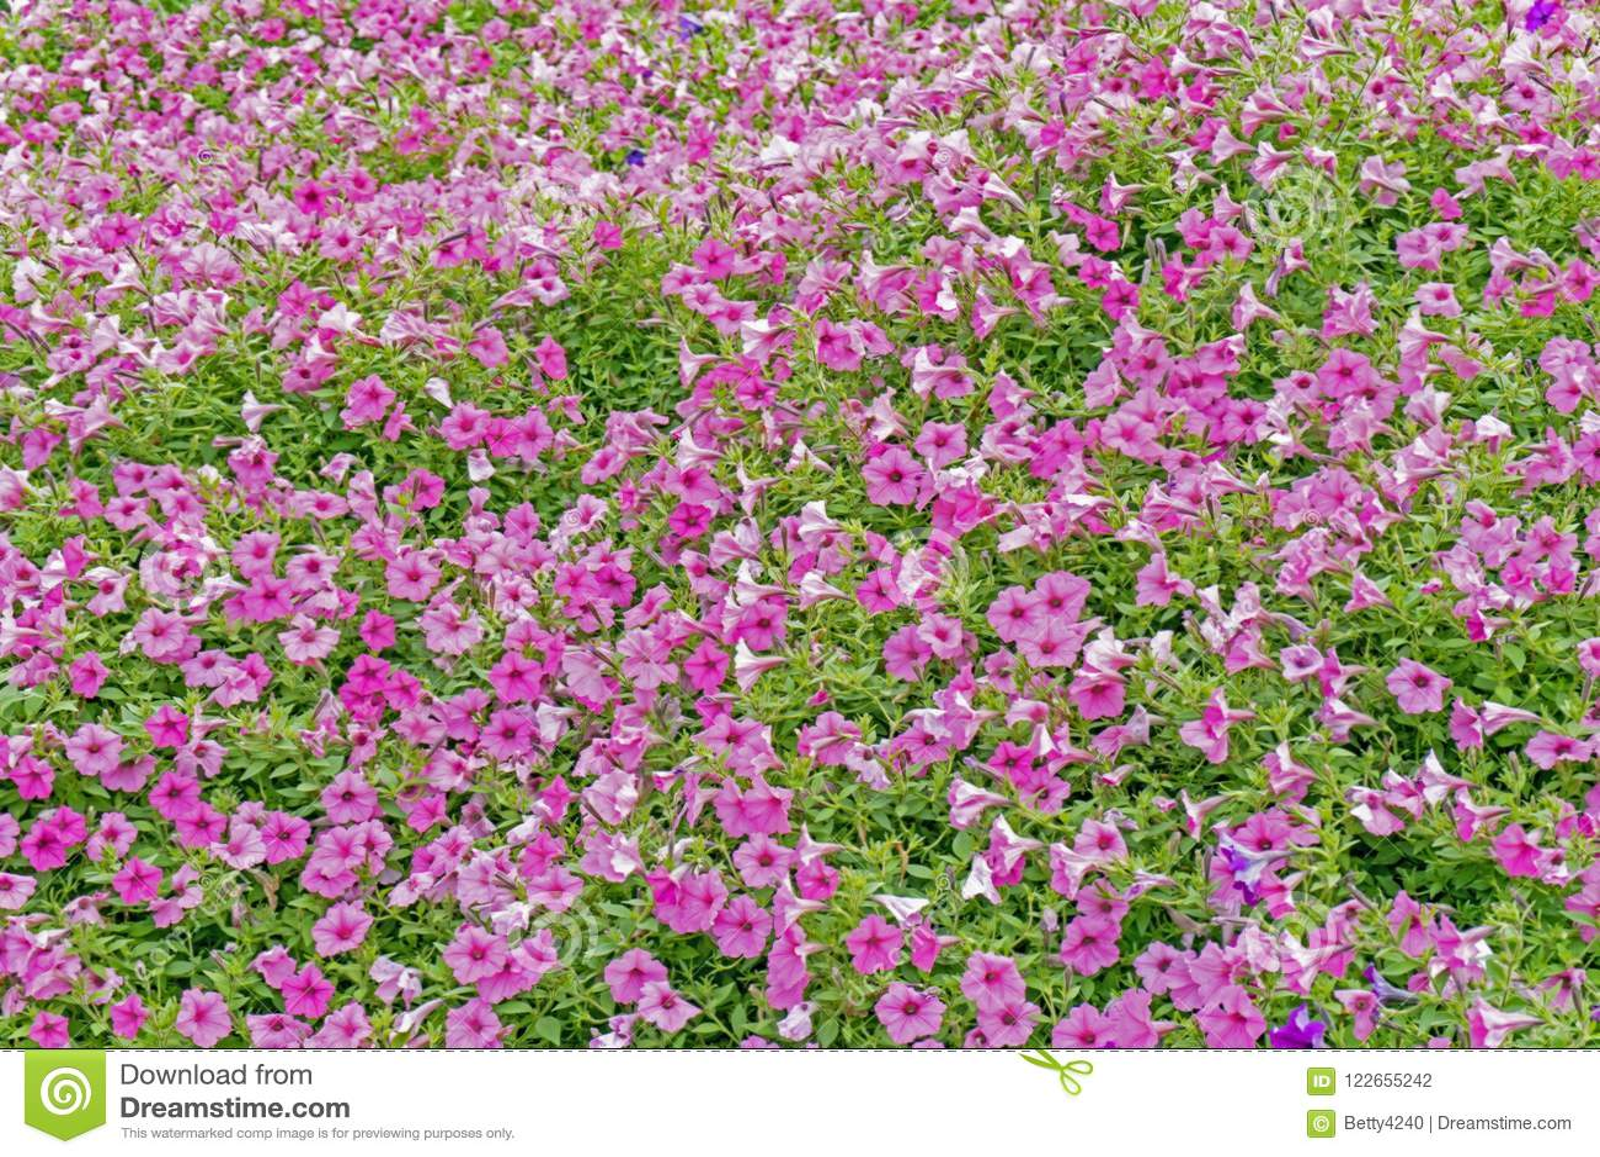 Un champ des gloires de matin fleurissent avec un fond vert de feuille